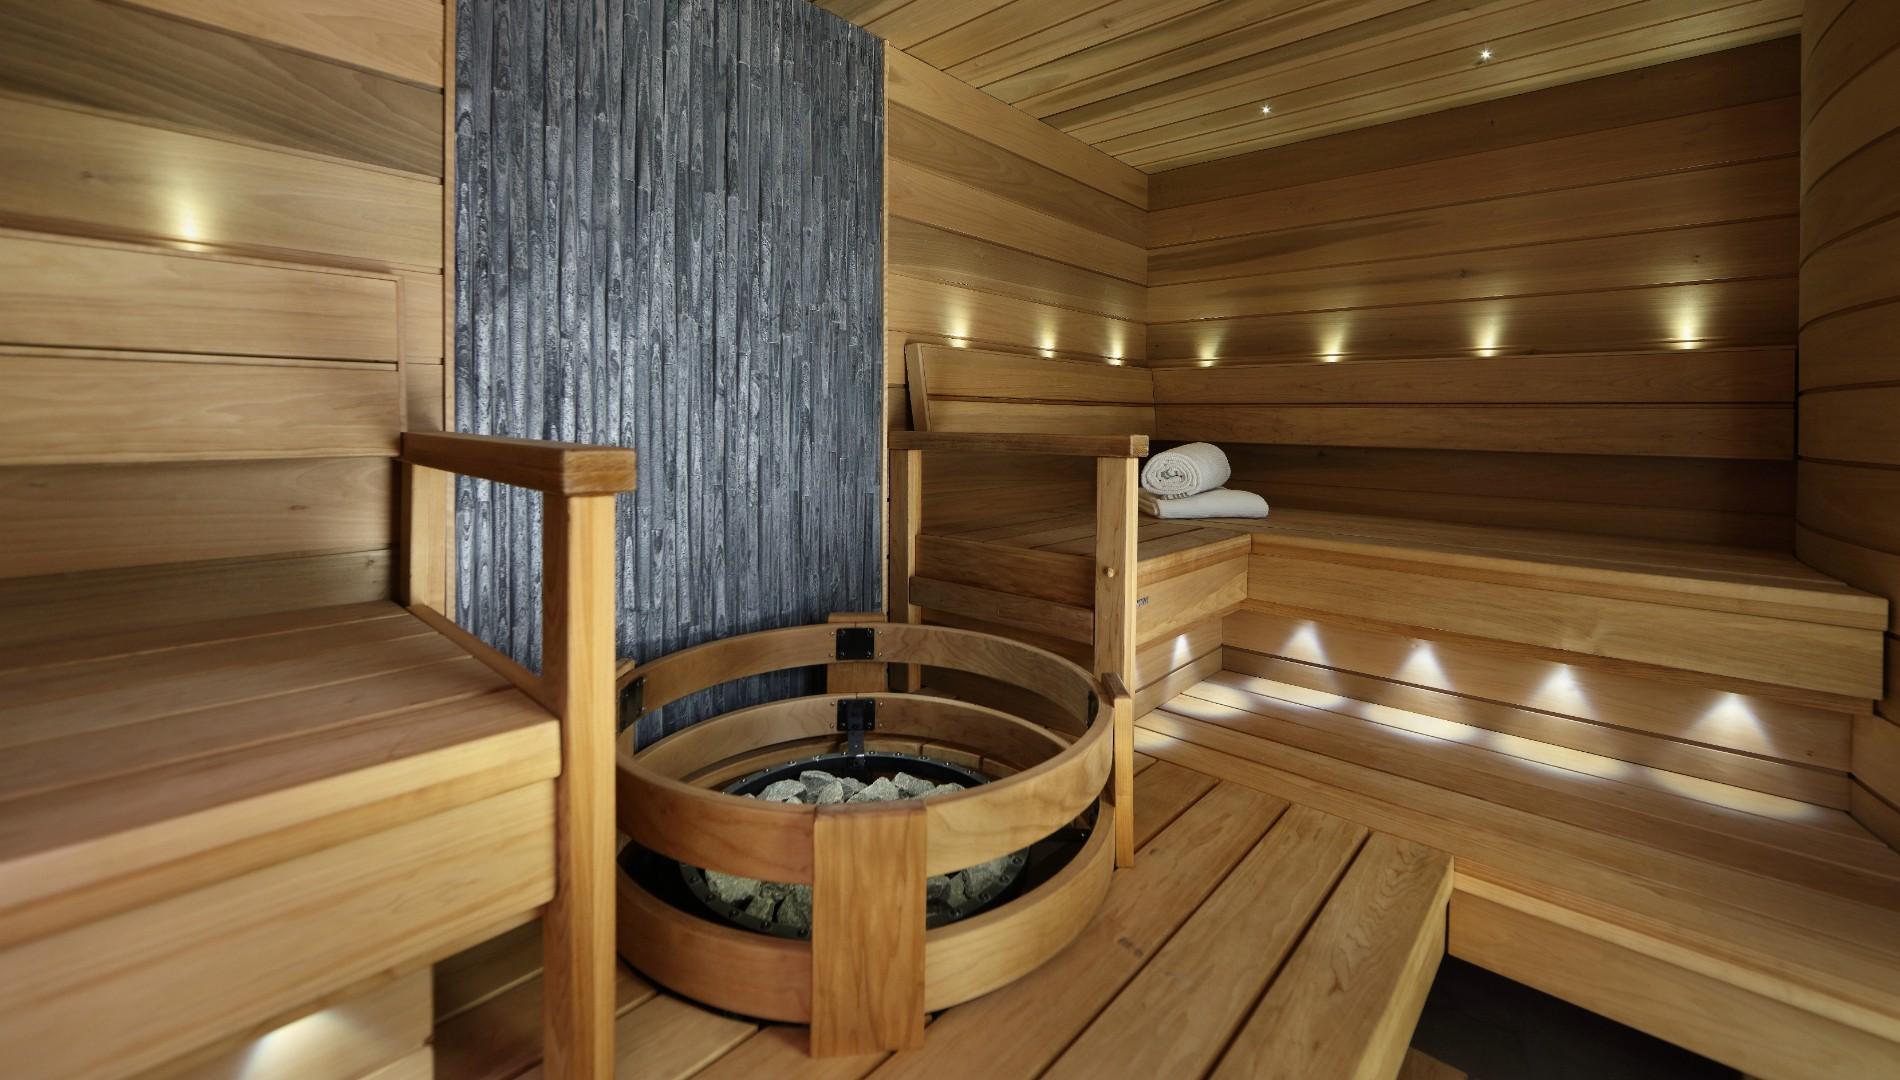 ulysses-sauna